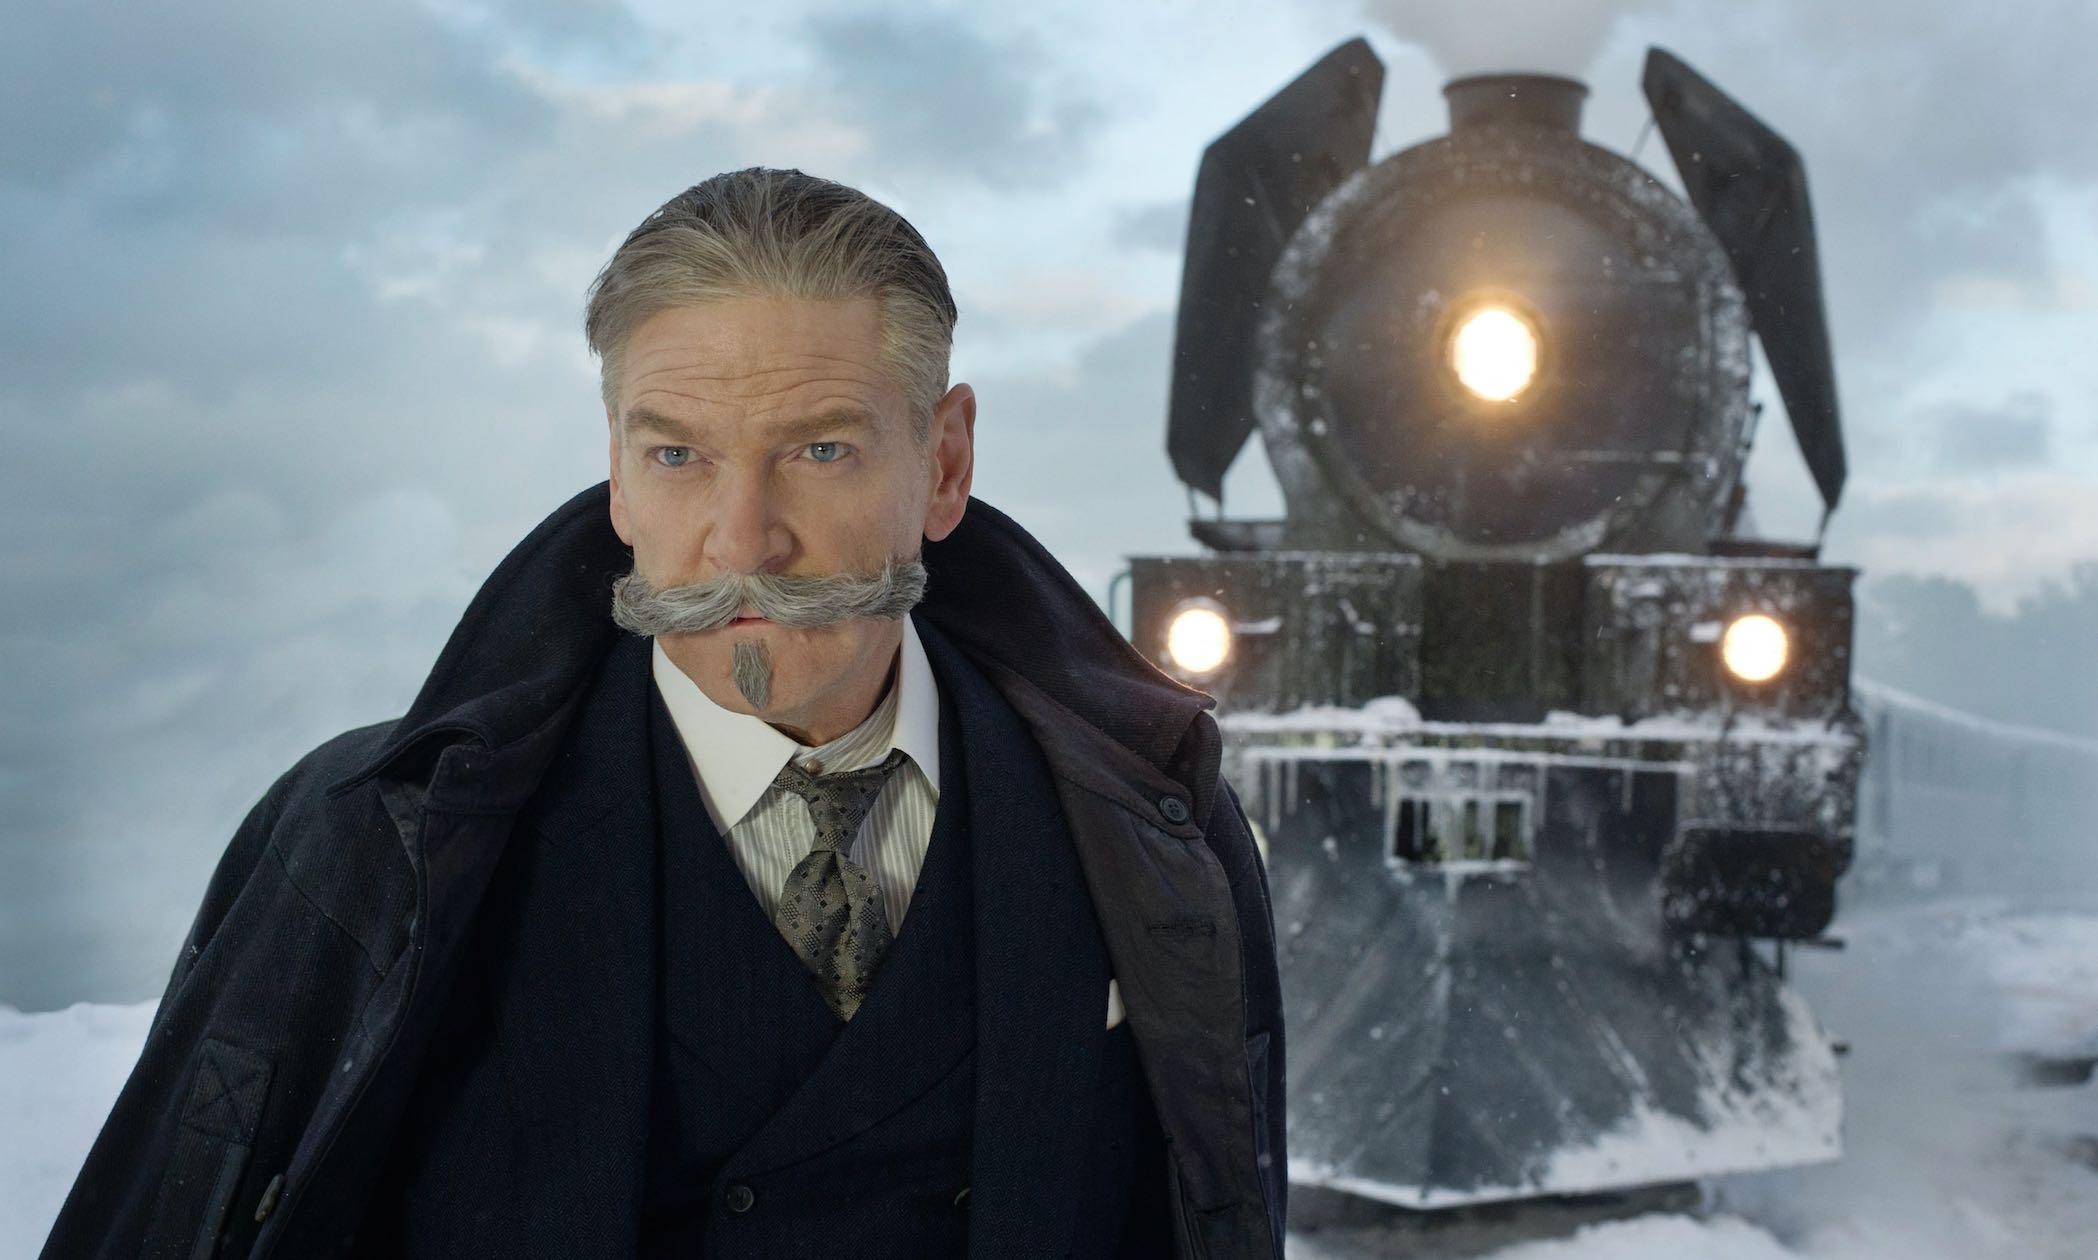 Murder Orient Express